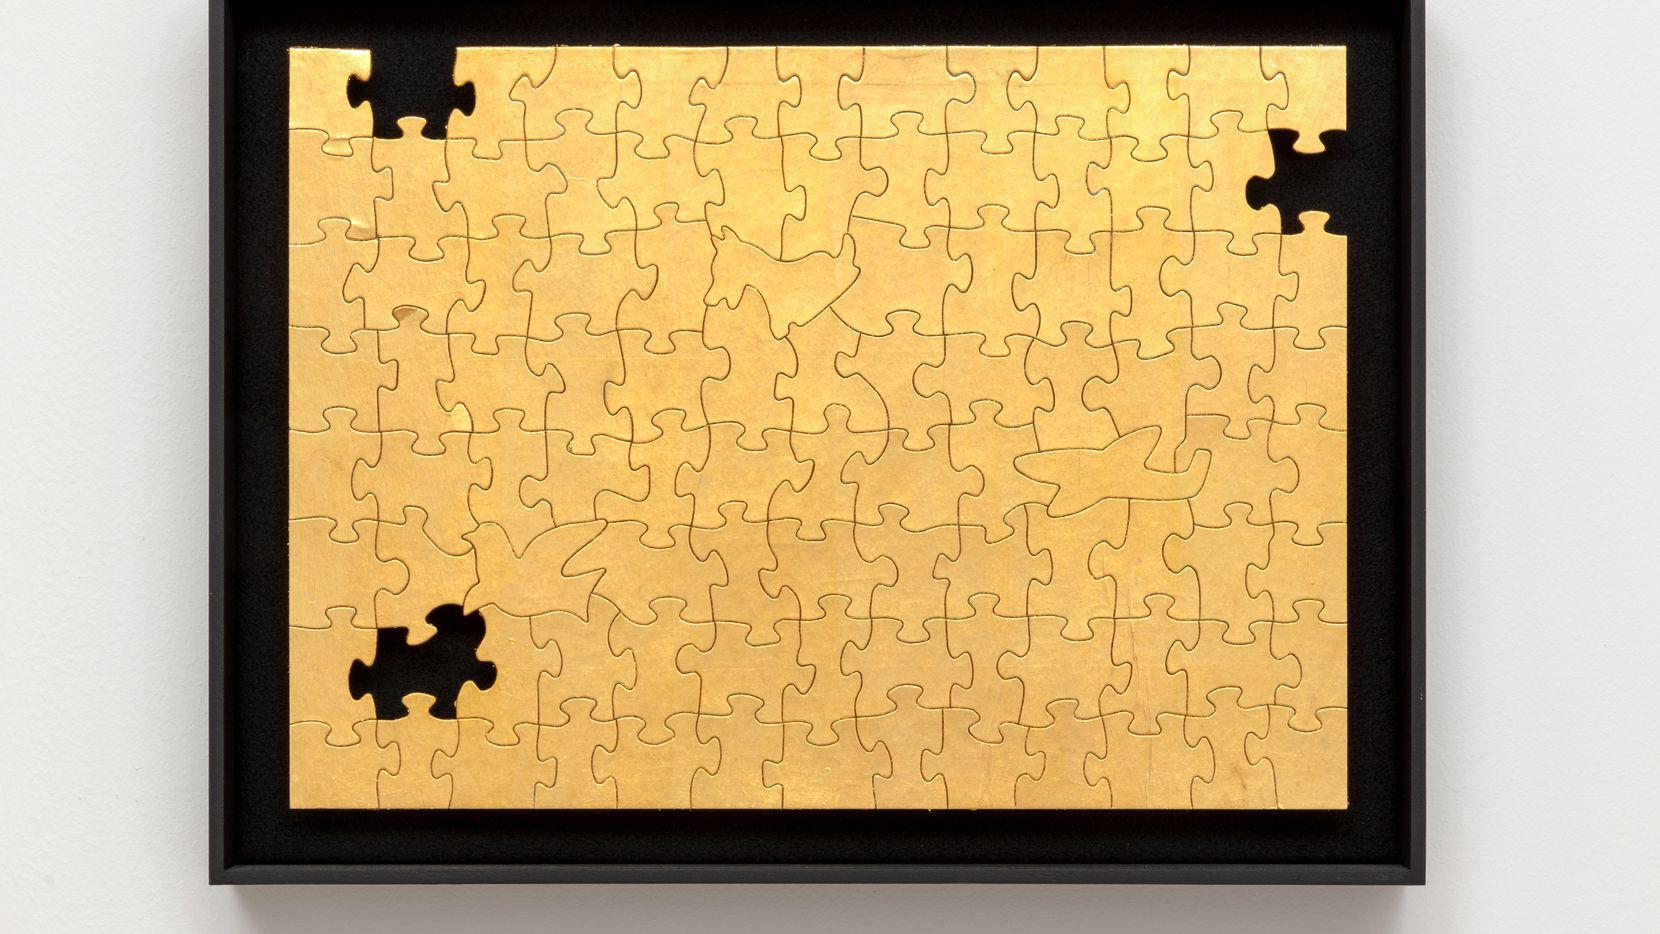 Gabriel Dawe, 'Missing No. 4,' 2019, 24-karat gold on puzzle in artist frame at the Gabriel Dawe exhibition titled 'Found' at Talley Dunn Gallery through Oct. 31.